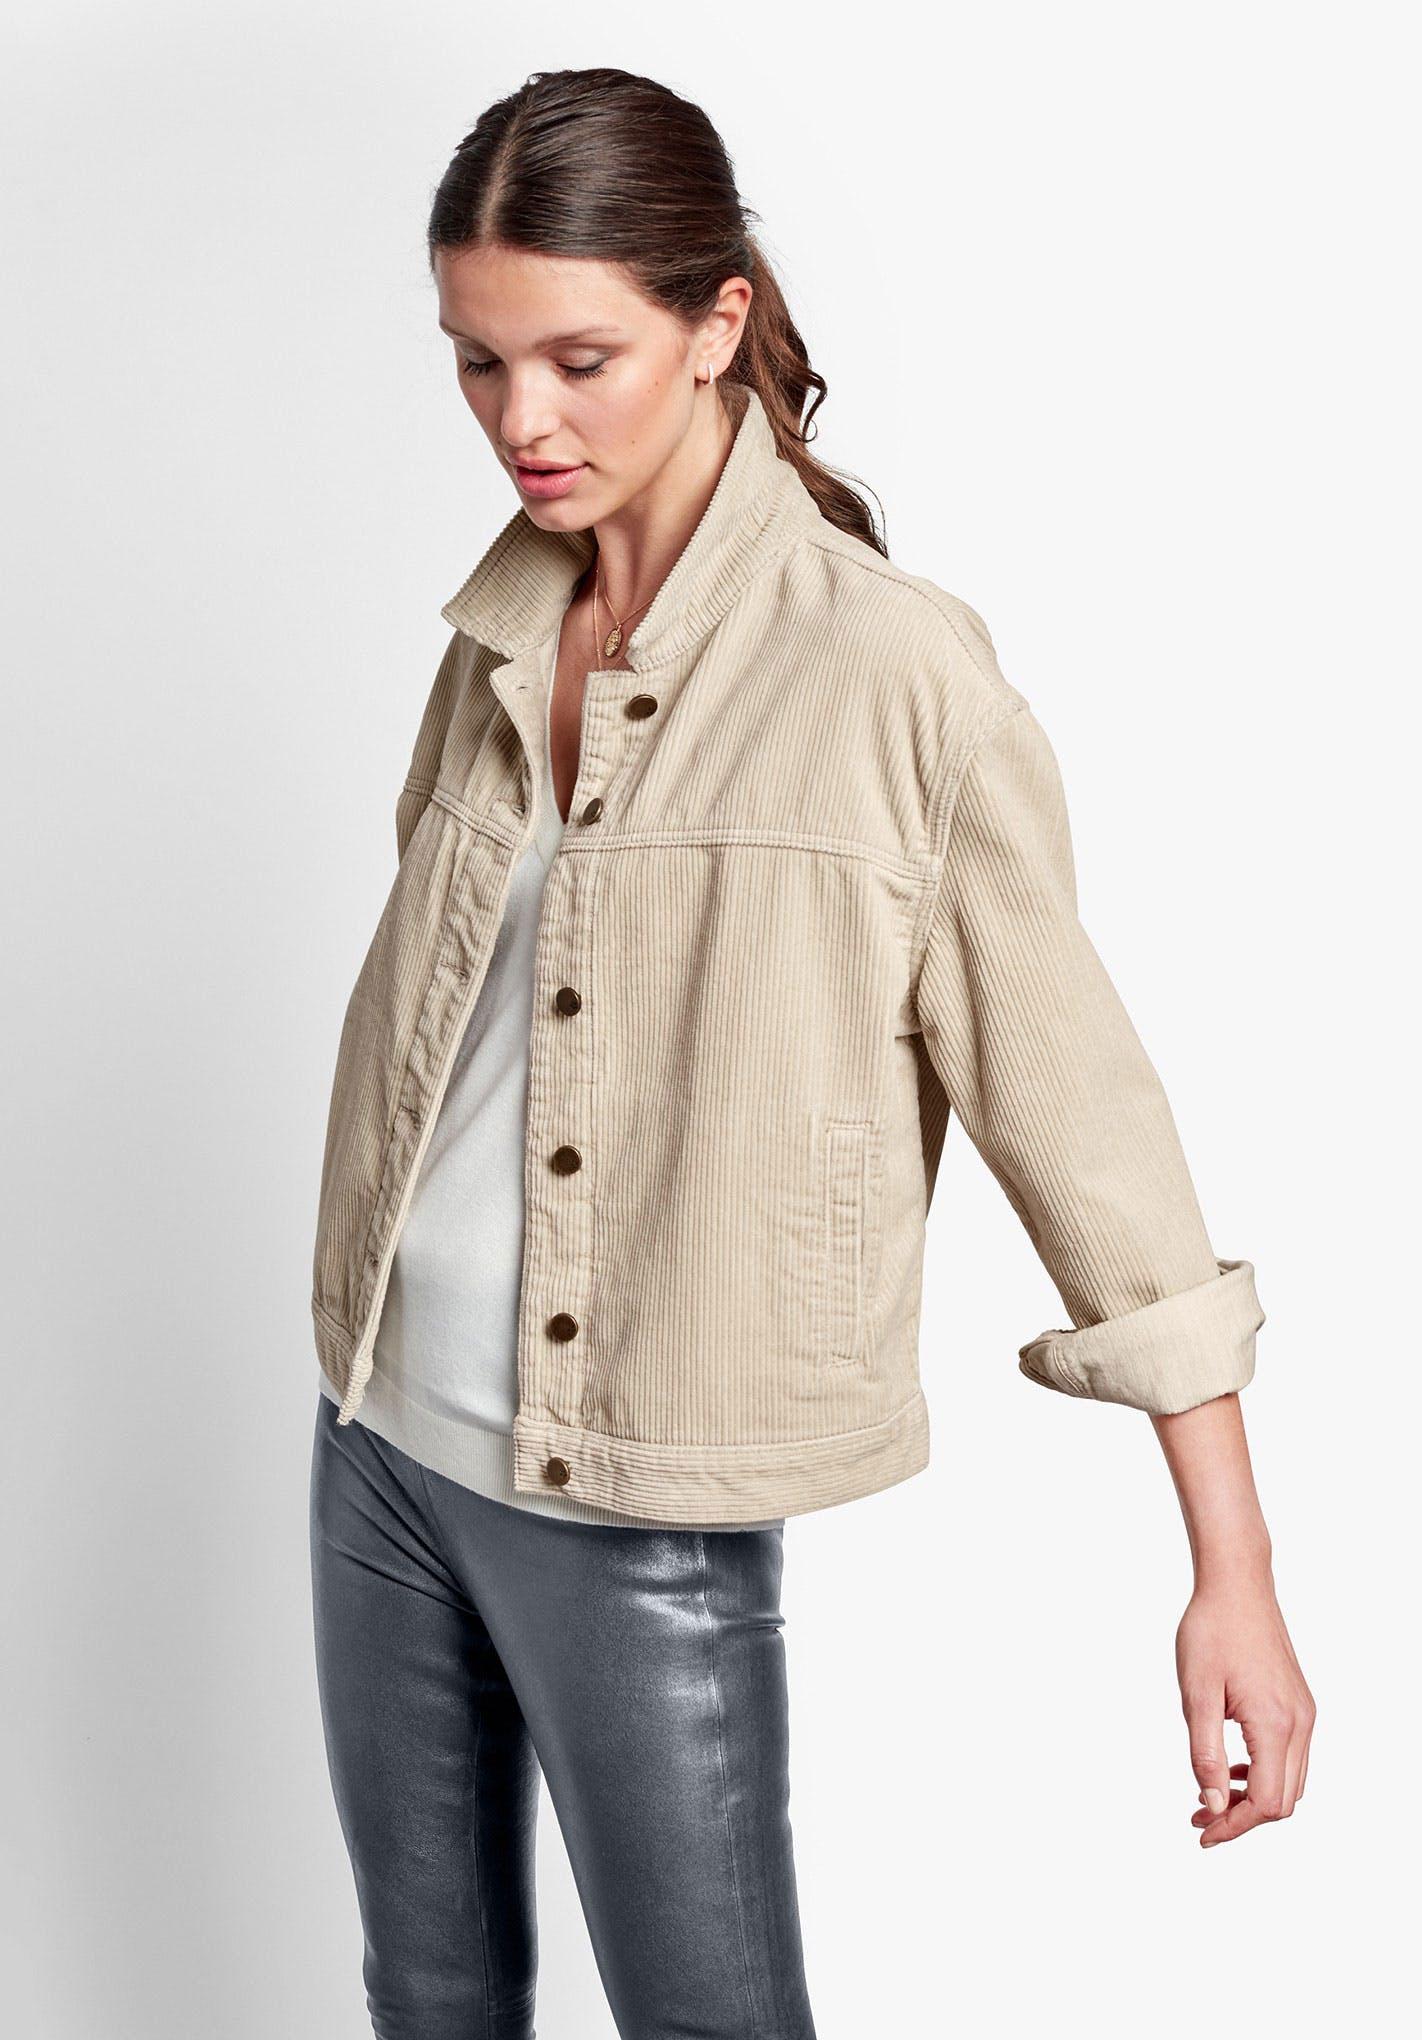 Hush Cord Jacket £89